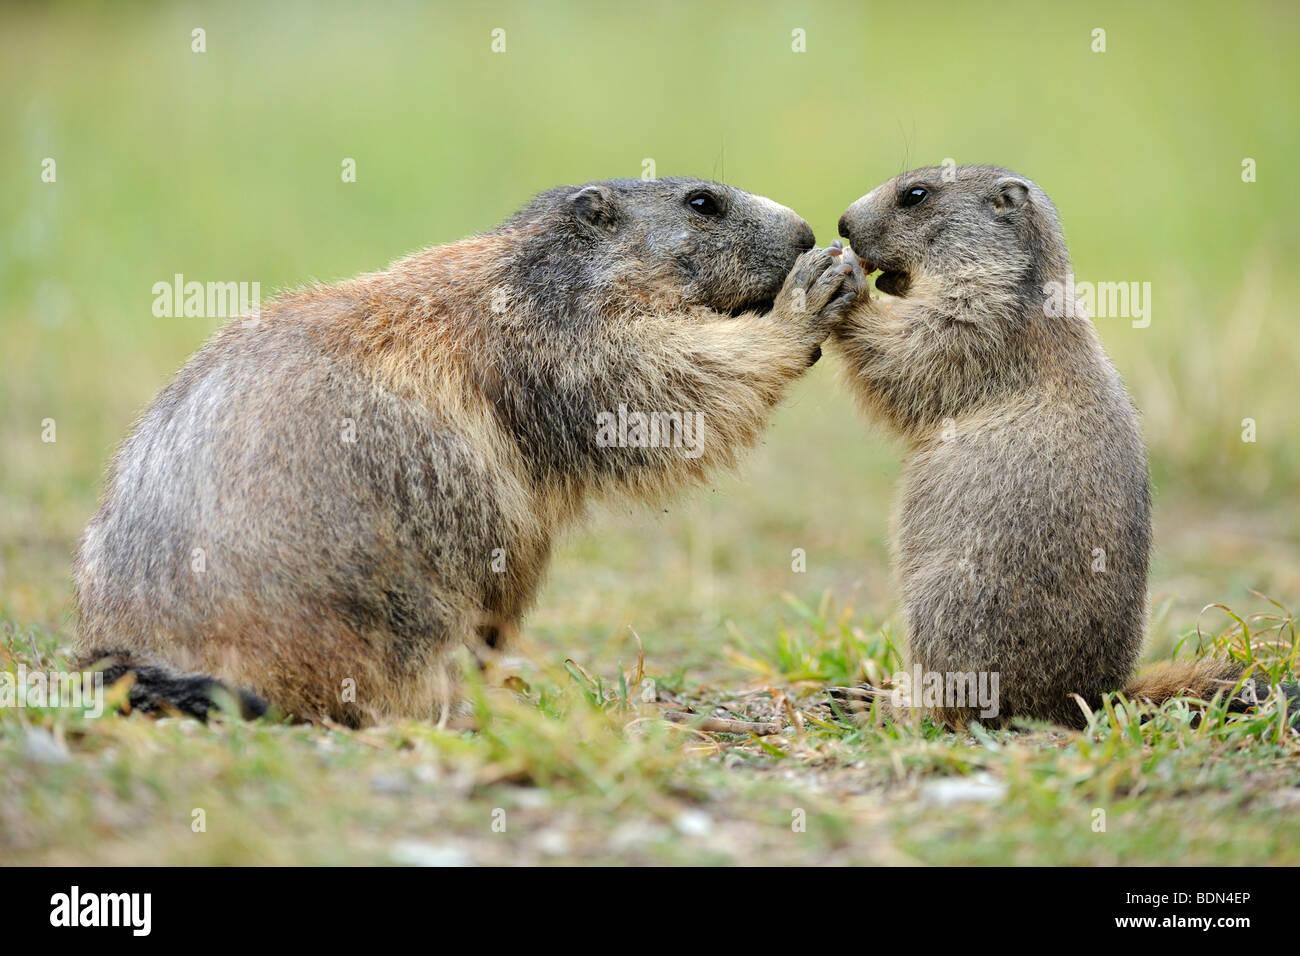 Alpine marmot (Marmota marmota) with young begging for food - Stock Image